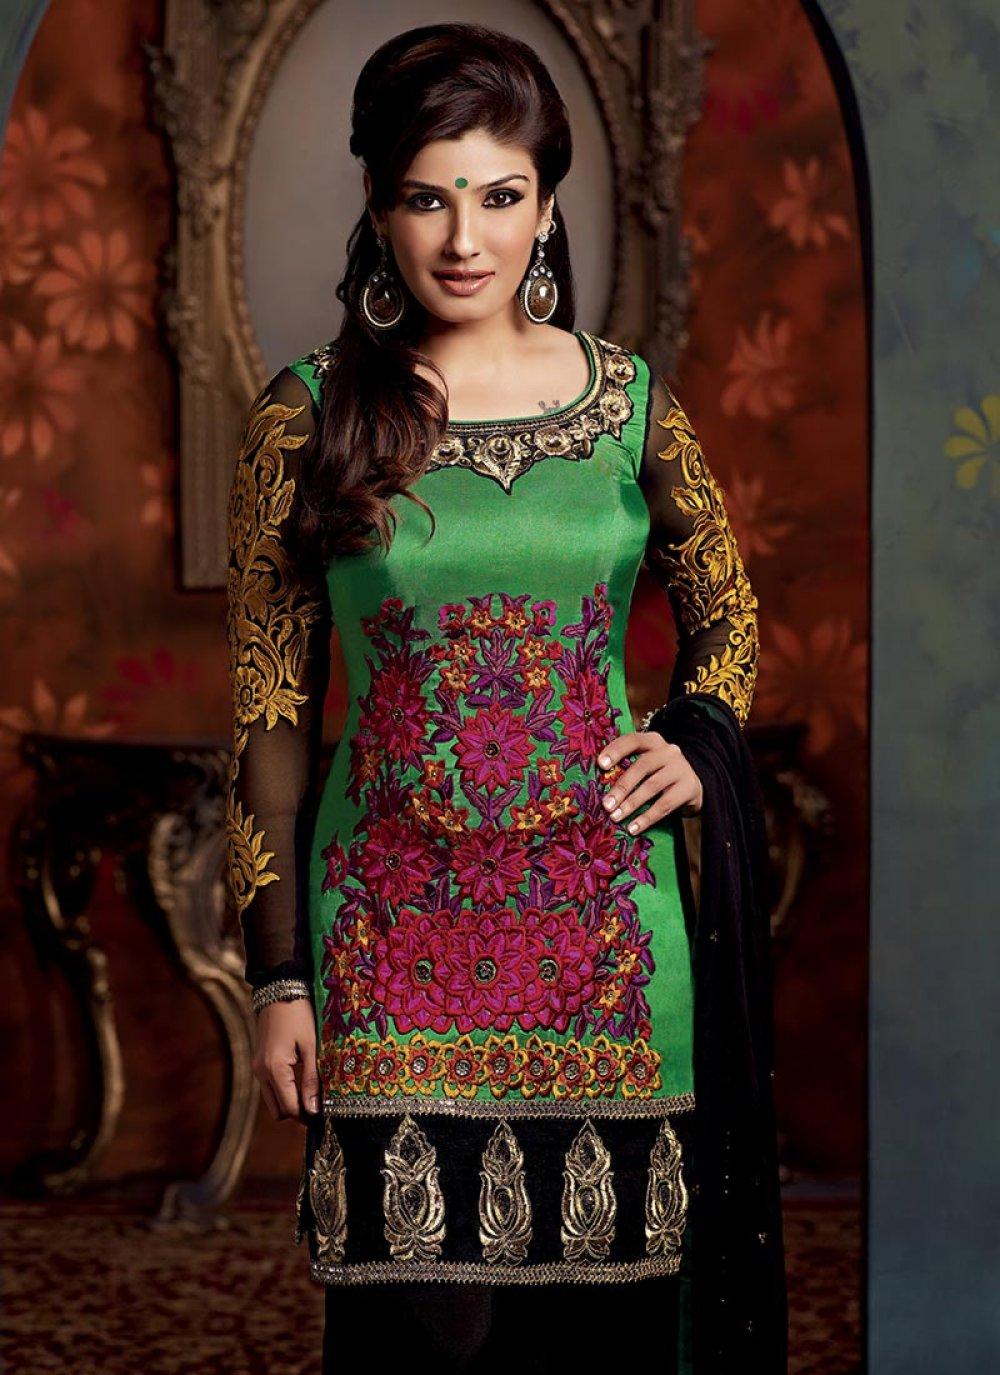 Green Resham Embroidered Salwar Suit